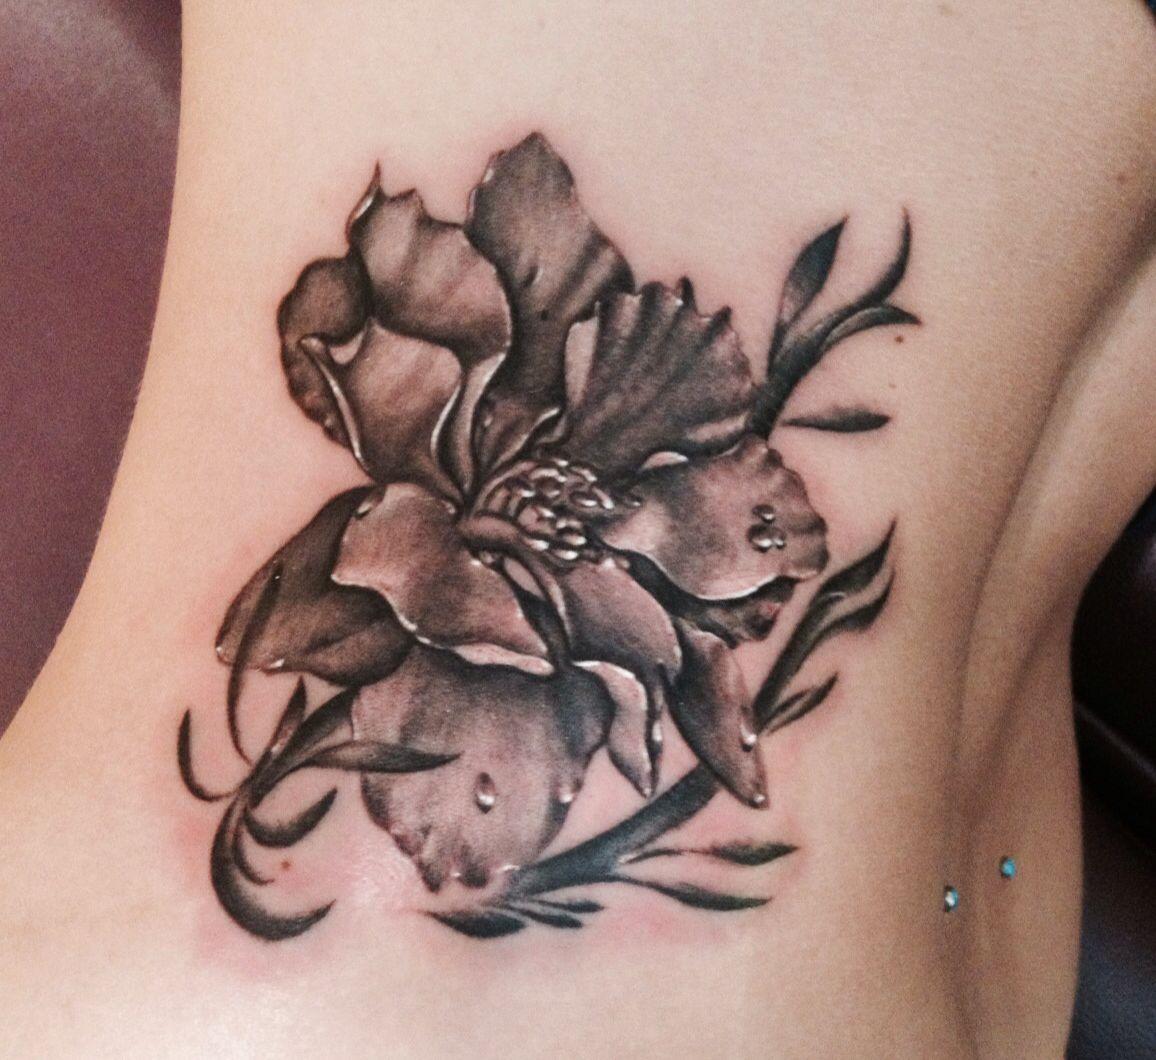 larkspur flower tattoo rebellious pinterest. Black Bedroom Furniture Sets. Home Design Ideas